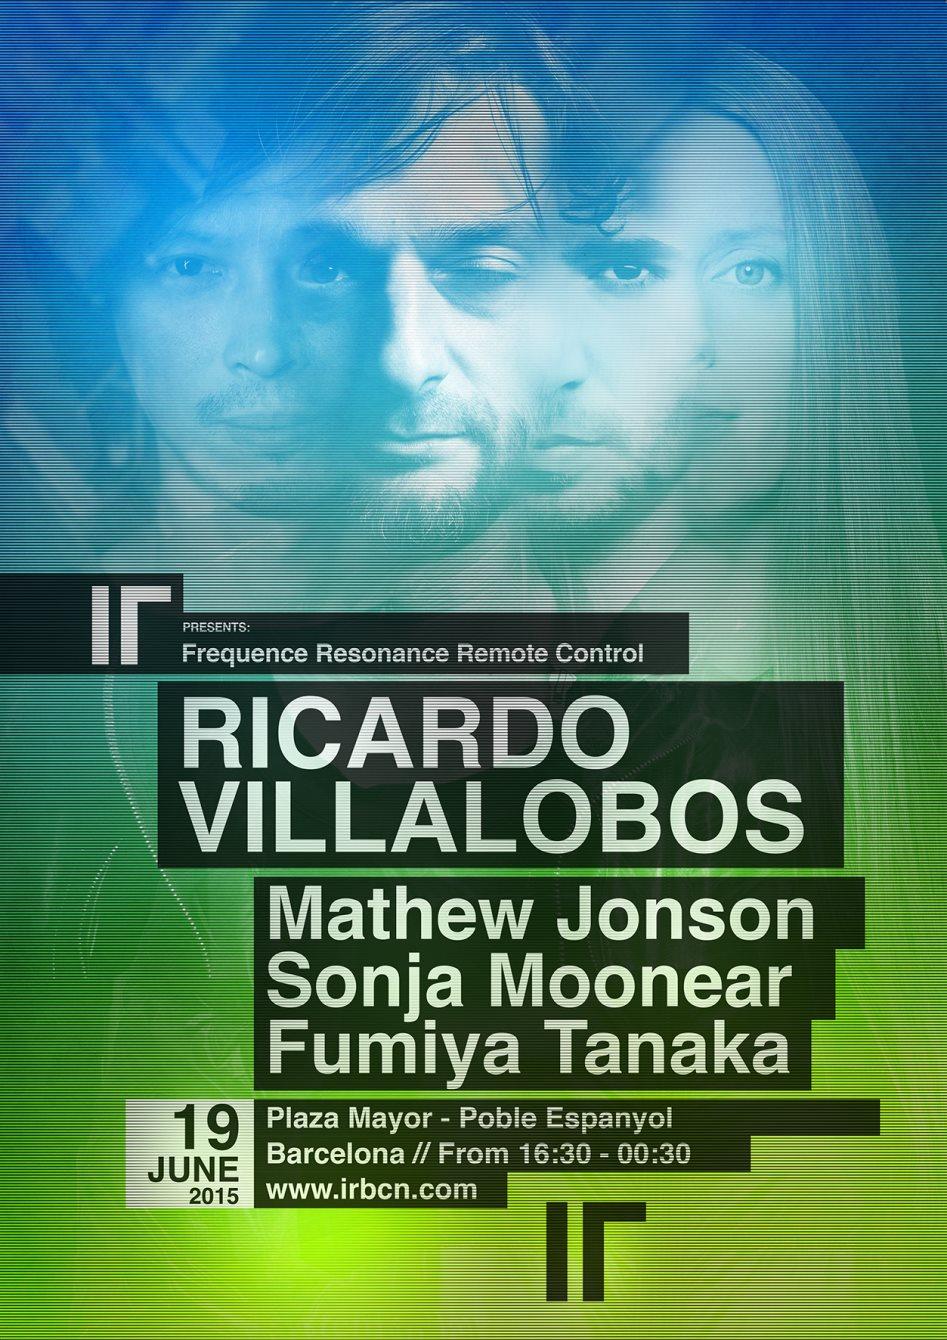 IR presents: FRRC by Ricardo Villalobos - Flyer front